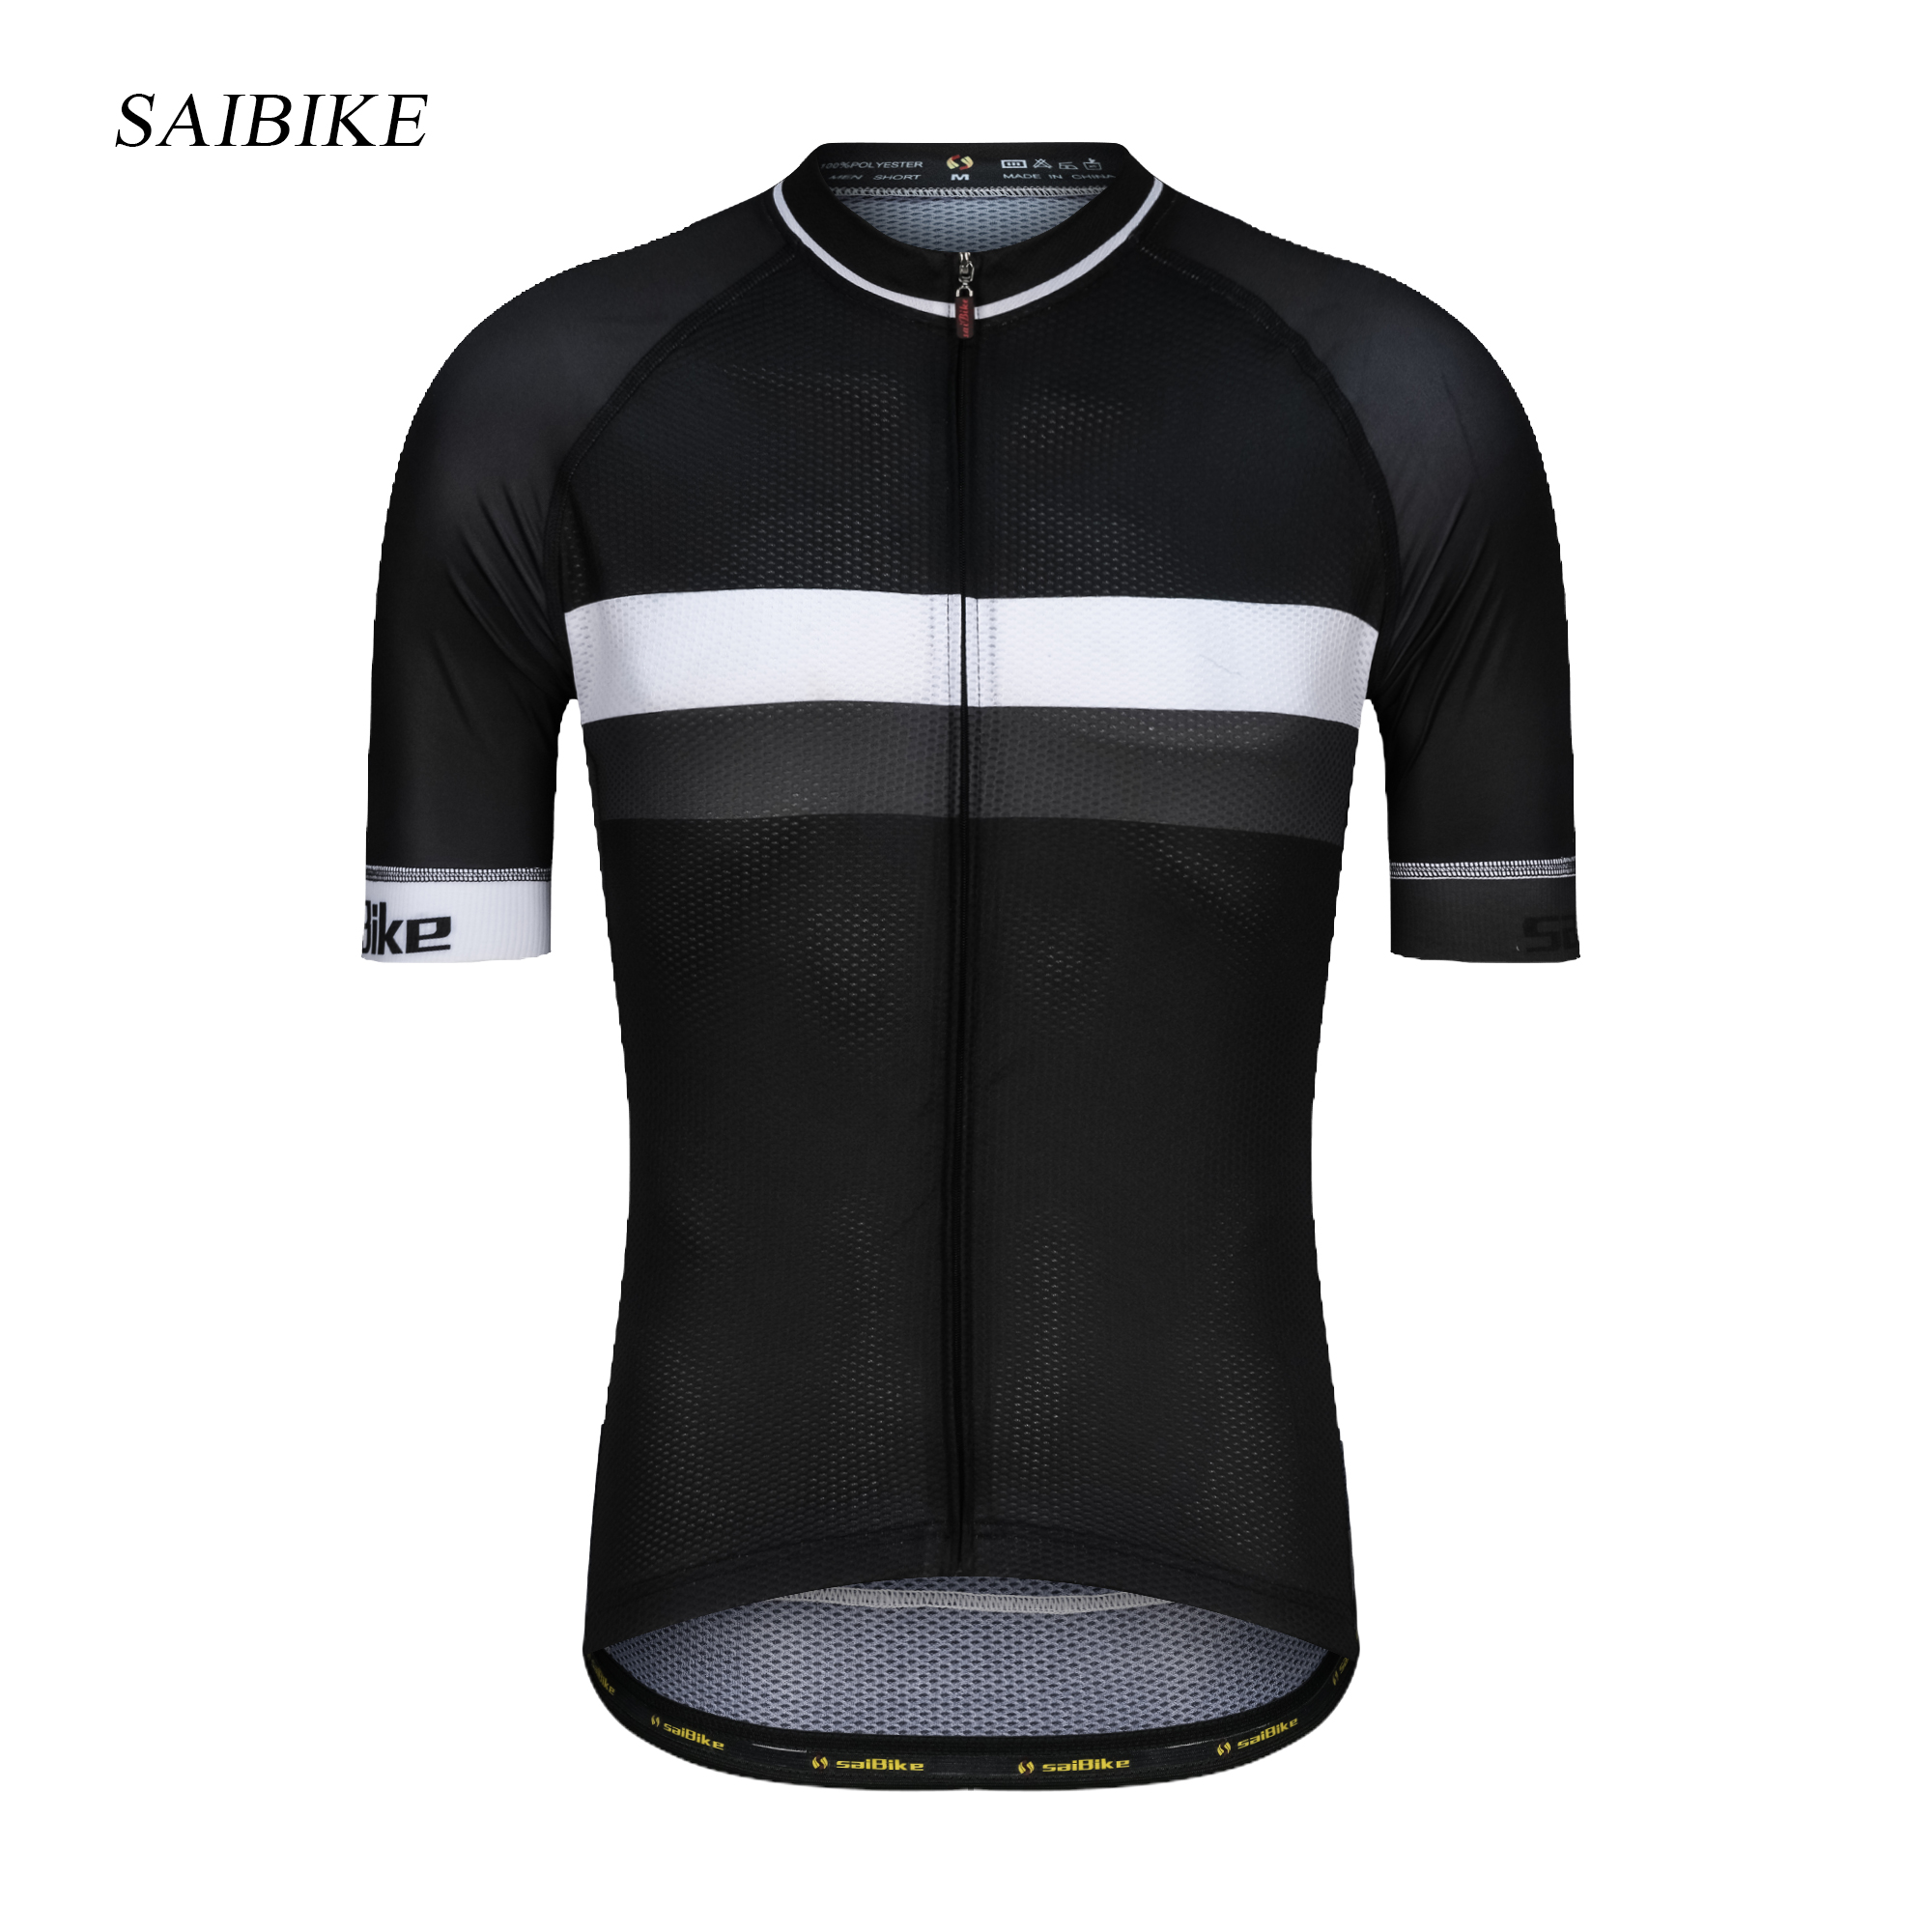 Saibike 2019 cycling wear mens summer short sleeve cycling top cycling wear outdoor cycling sports shirt